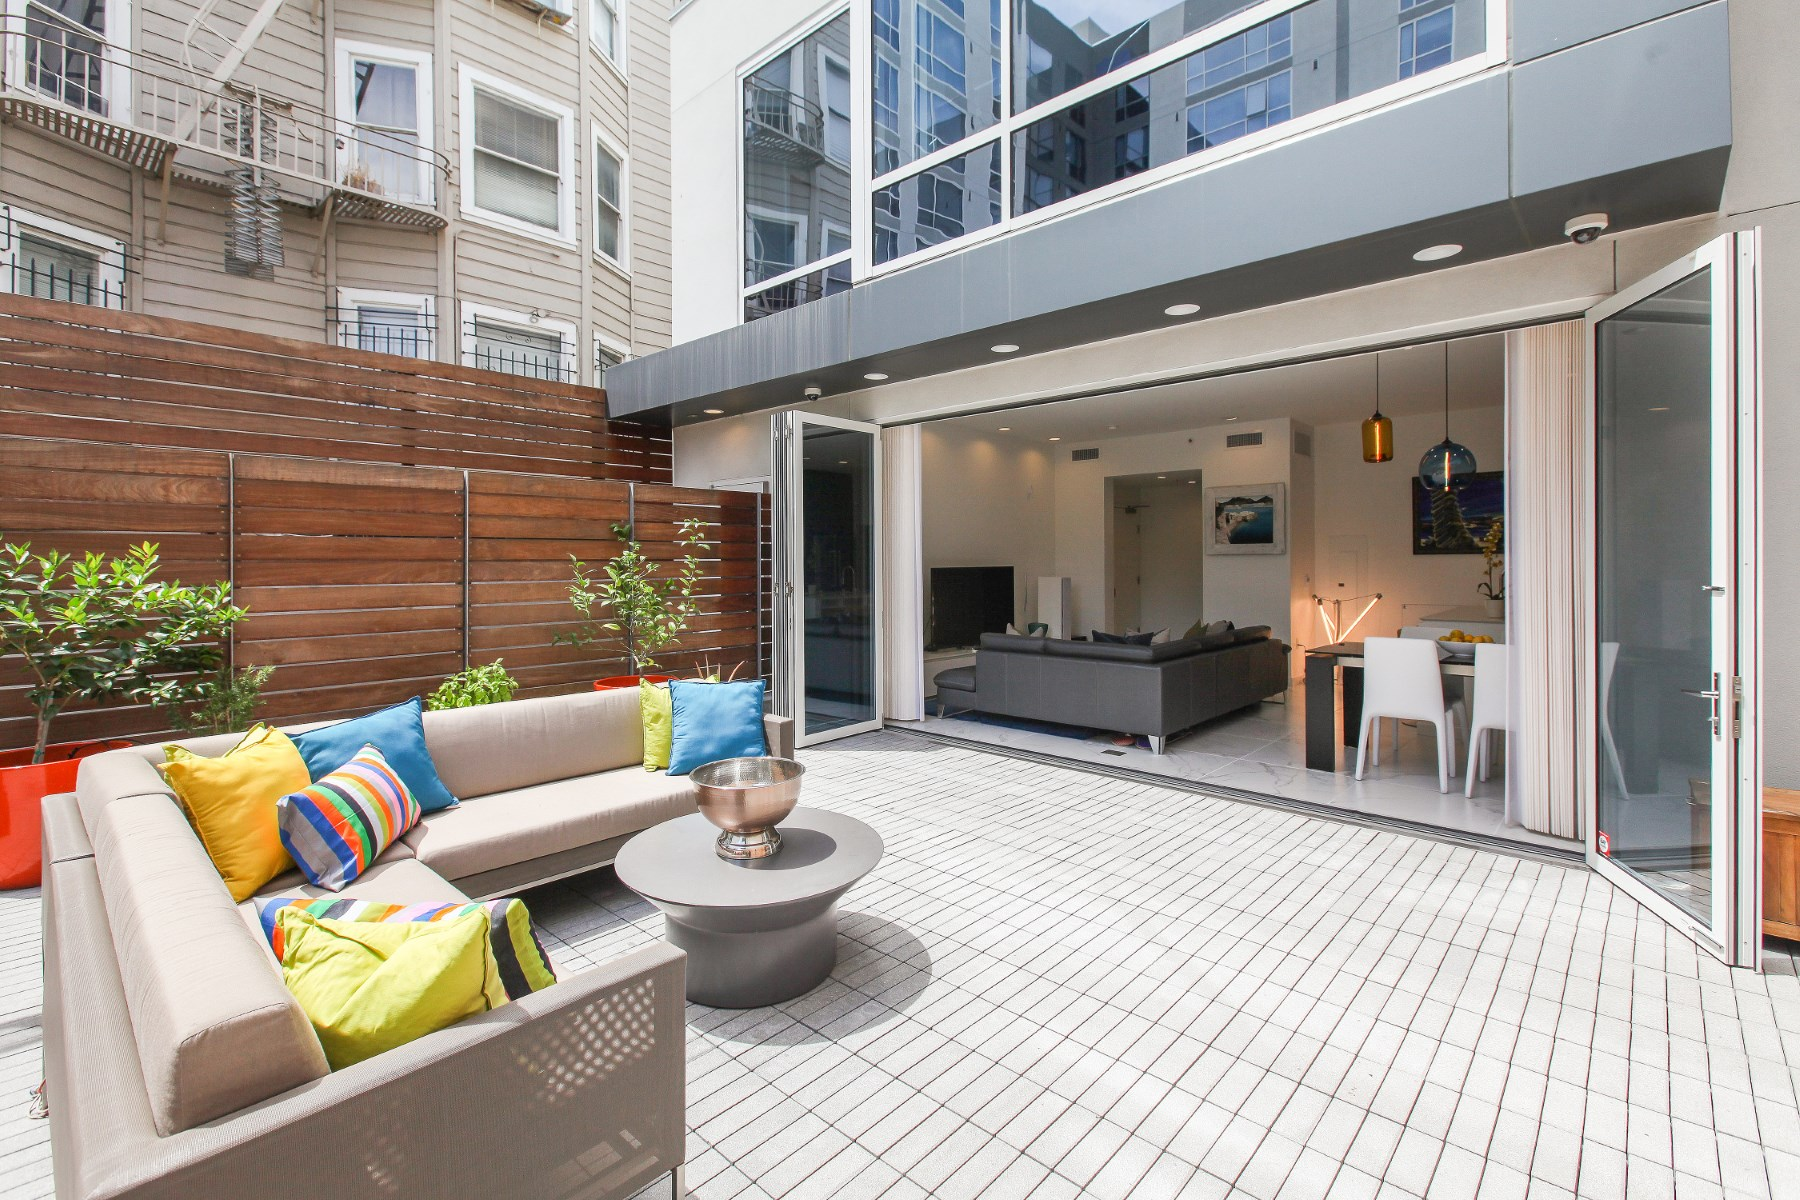 共管物業 為 出售 在 House-like Nob Hill Condominium 1771 Washington St # 3 Nob Hill, San Francisco, 加利福尼亞州, 94109 美國